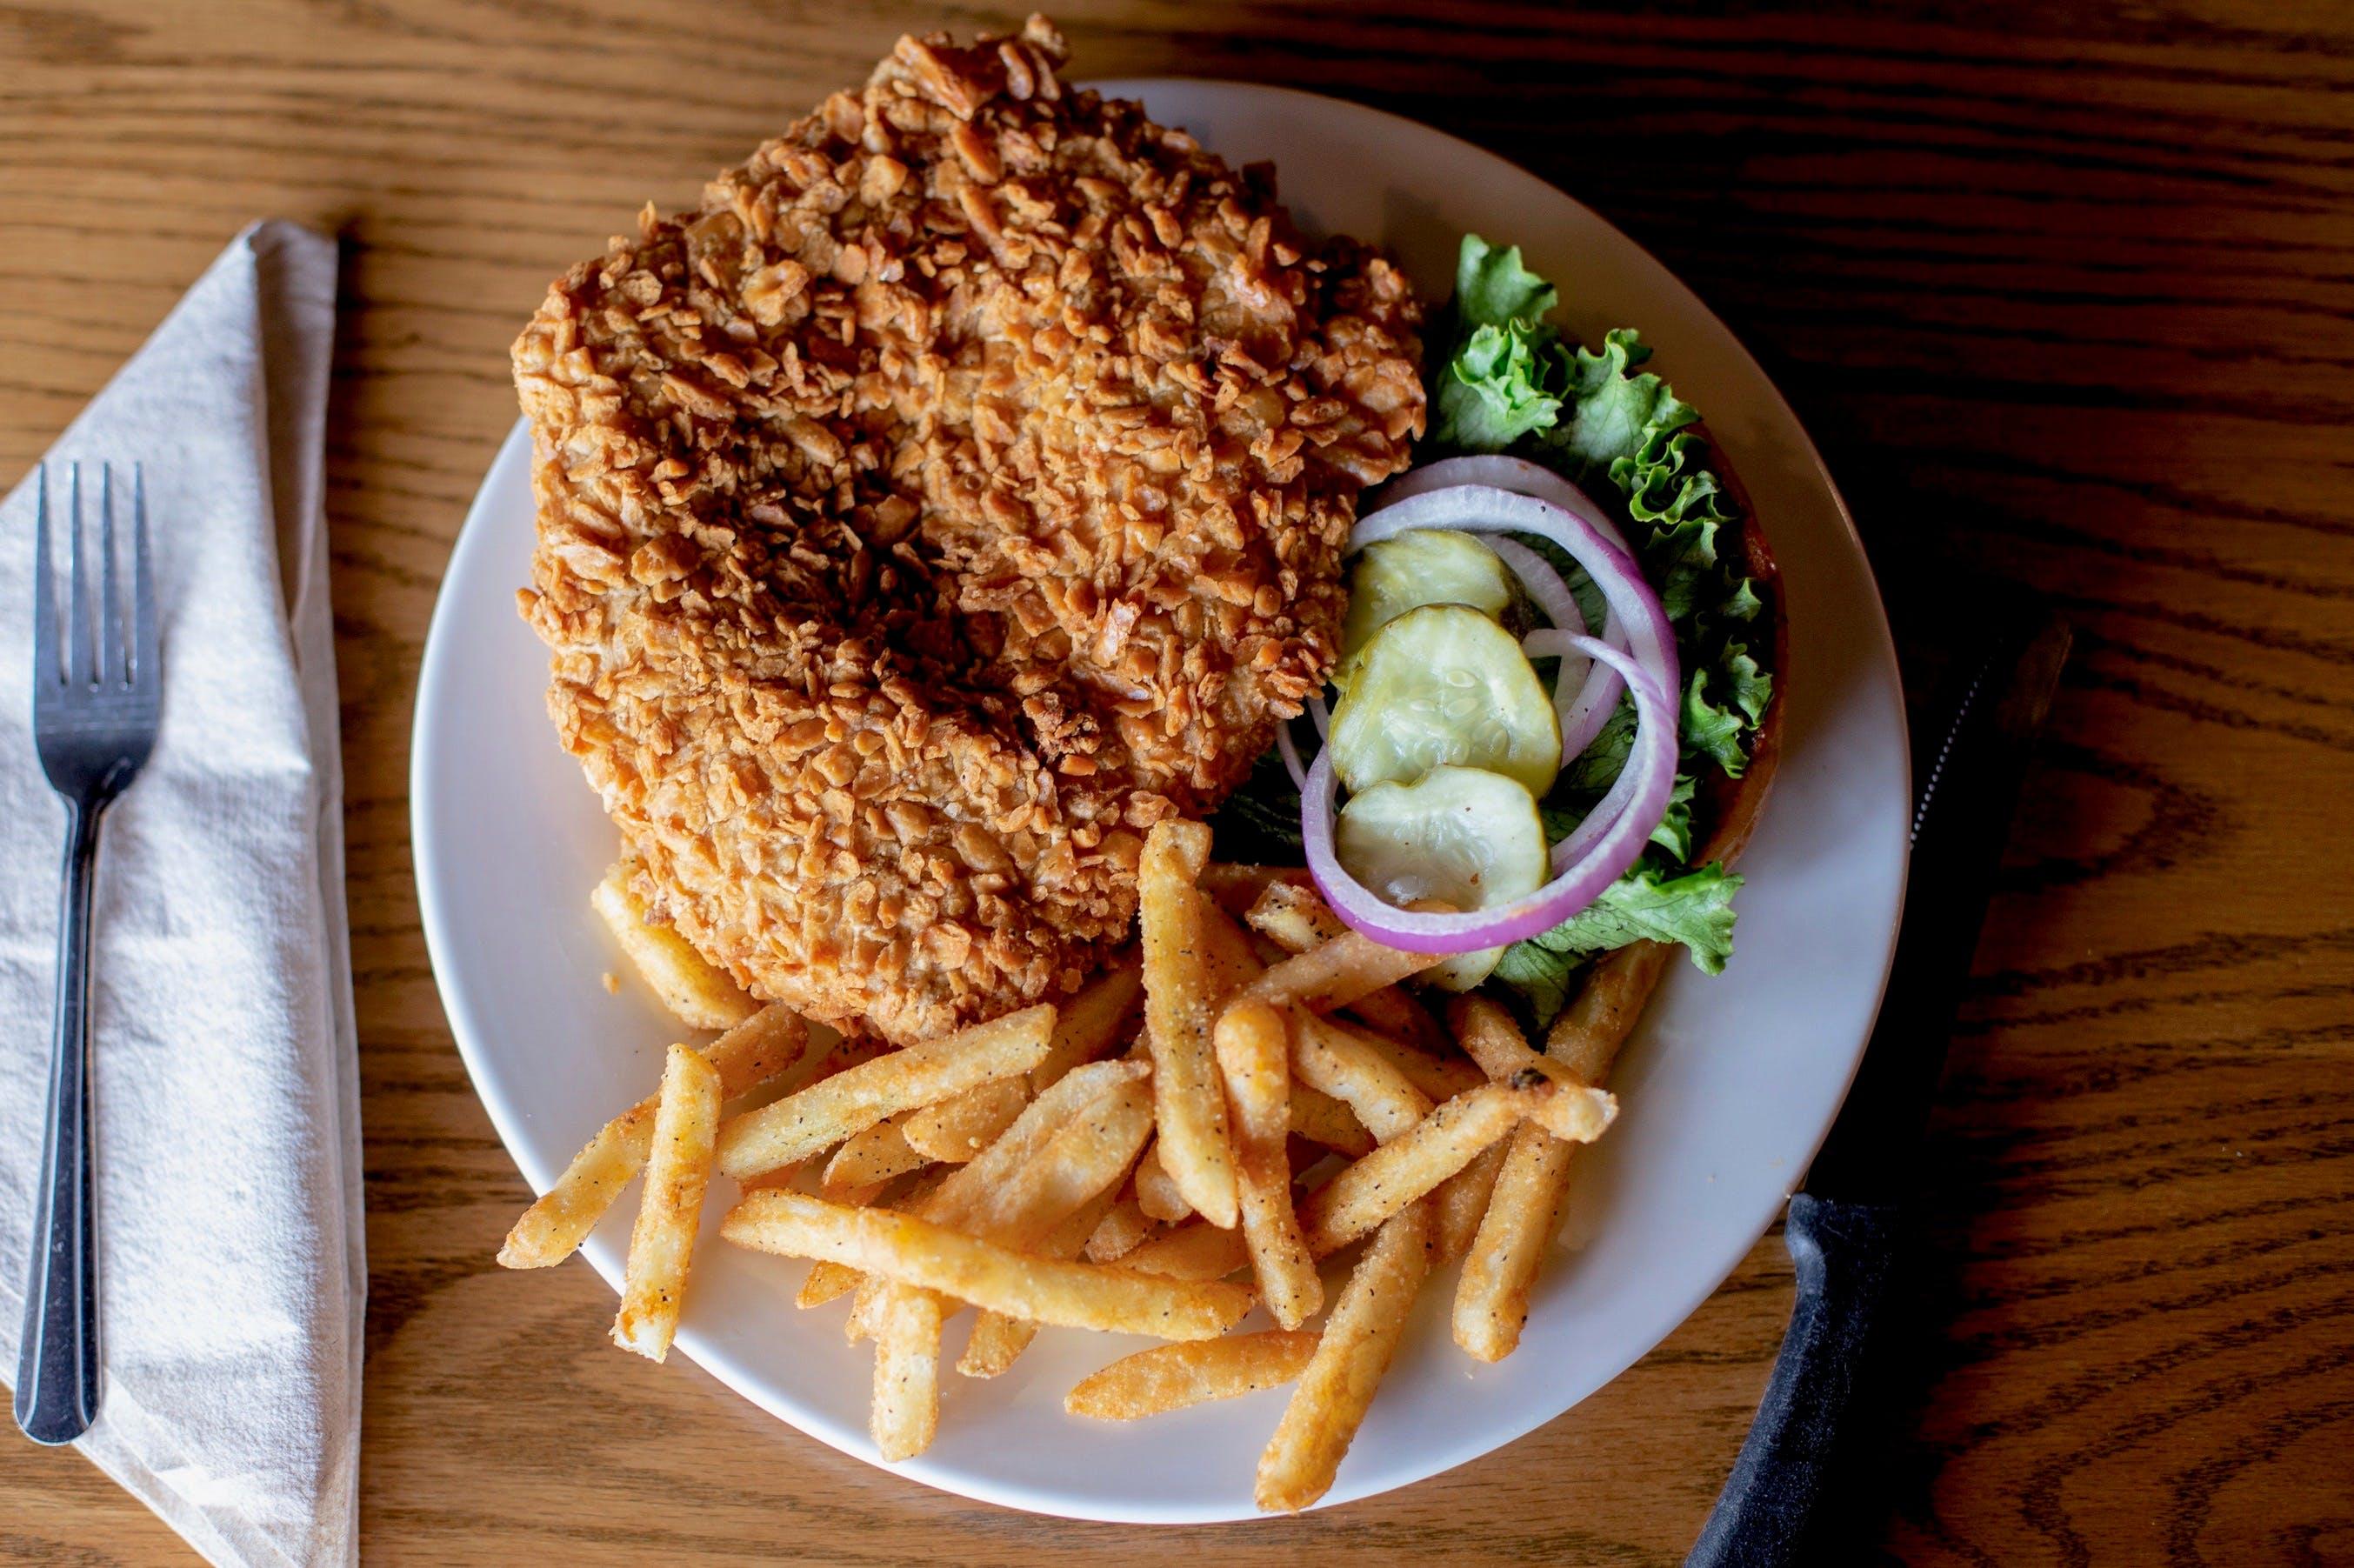 Pork Tenderloin Sandwich from Set'em Up Jacks in Lawrence, KS